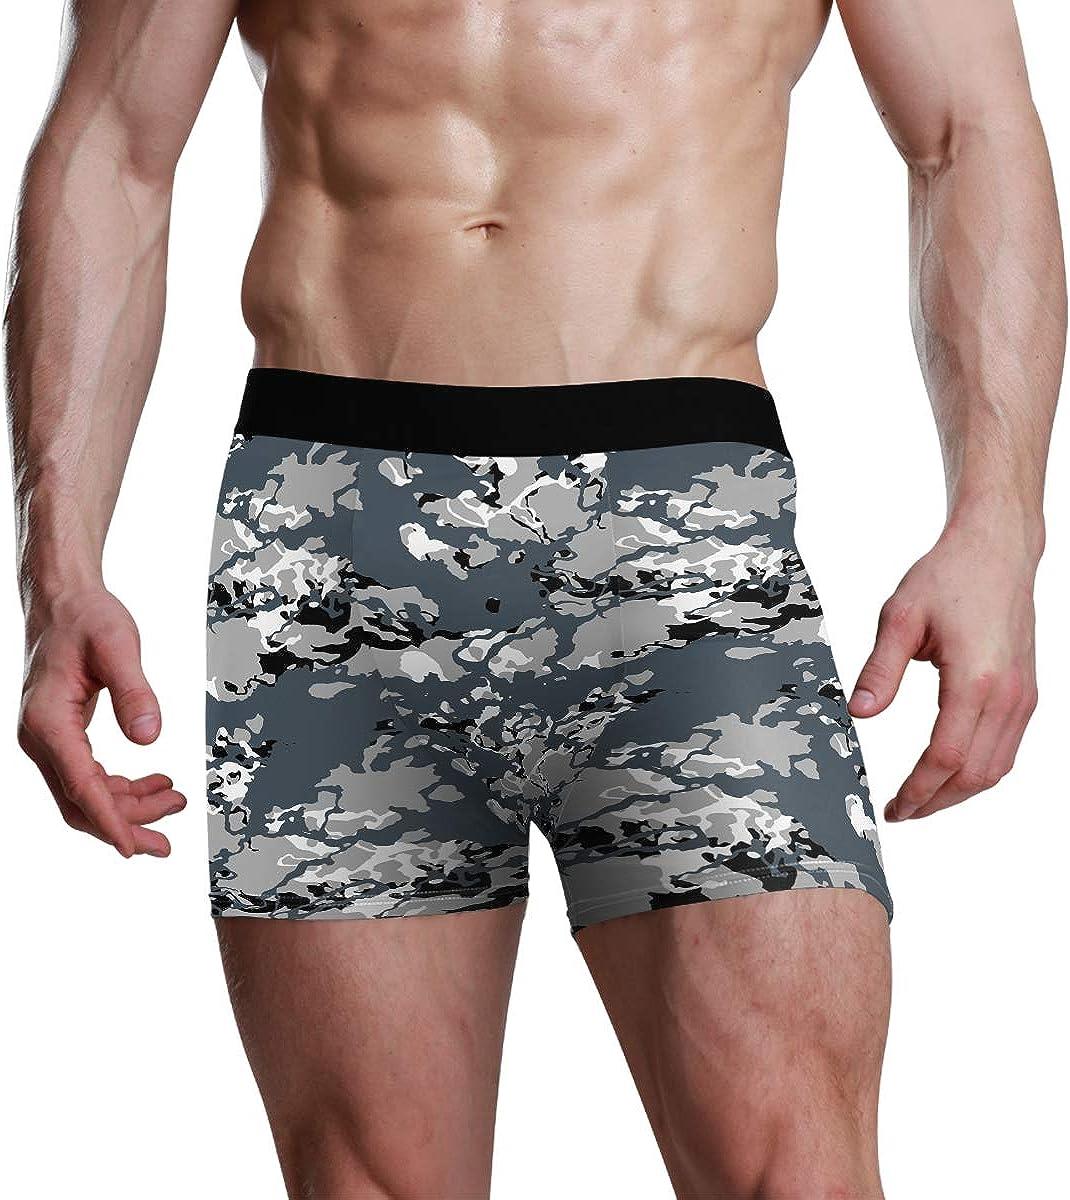 HangWang Mens Underwear Briefs Camo Black White and Gray Urban Camouflage Breathable Long Boxer Briefs Underwear Boys